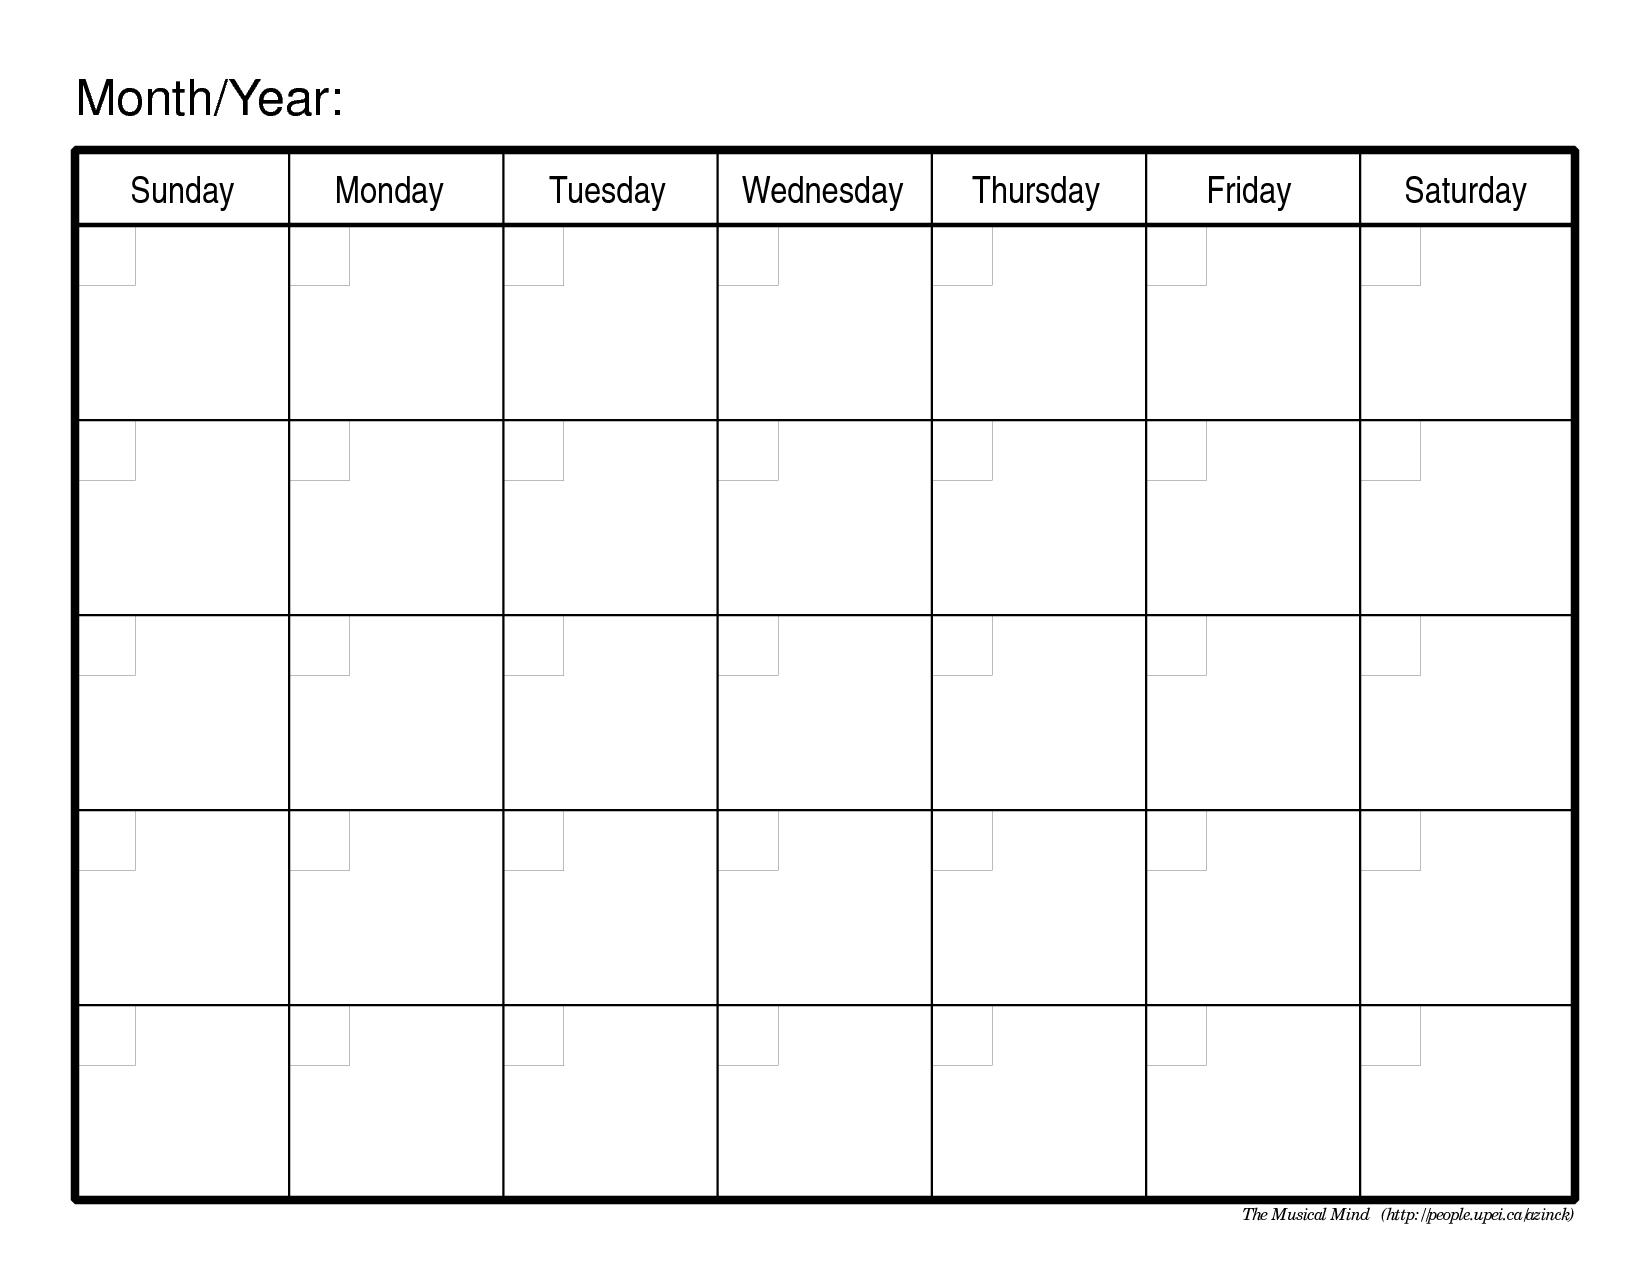 Free Printable Calendar - For My Running Schedule?? | September regarding Printable Calendar Month By Month